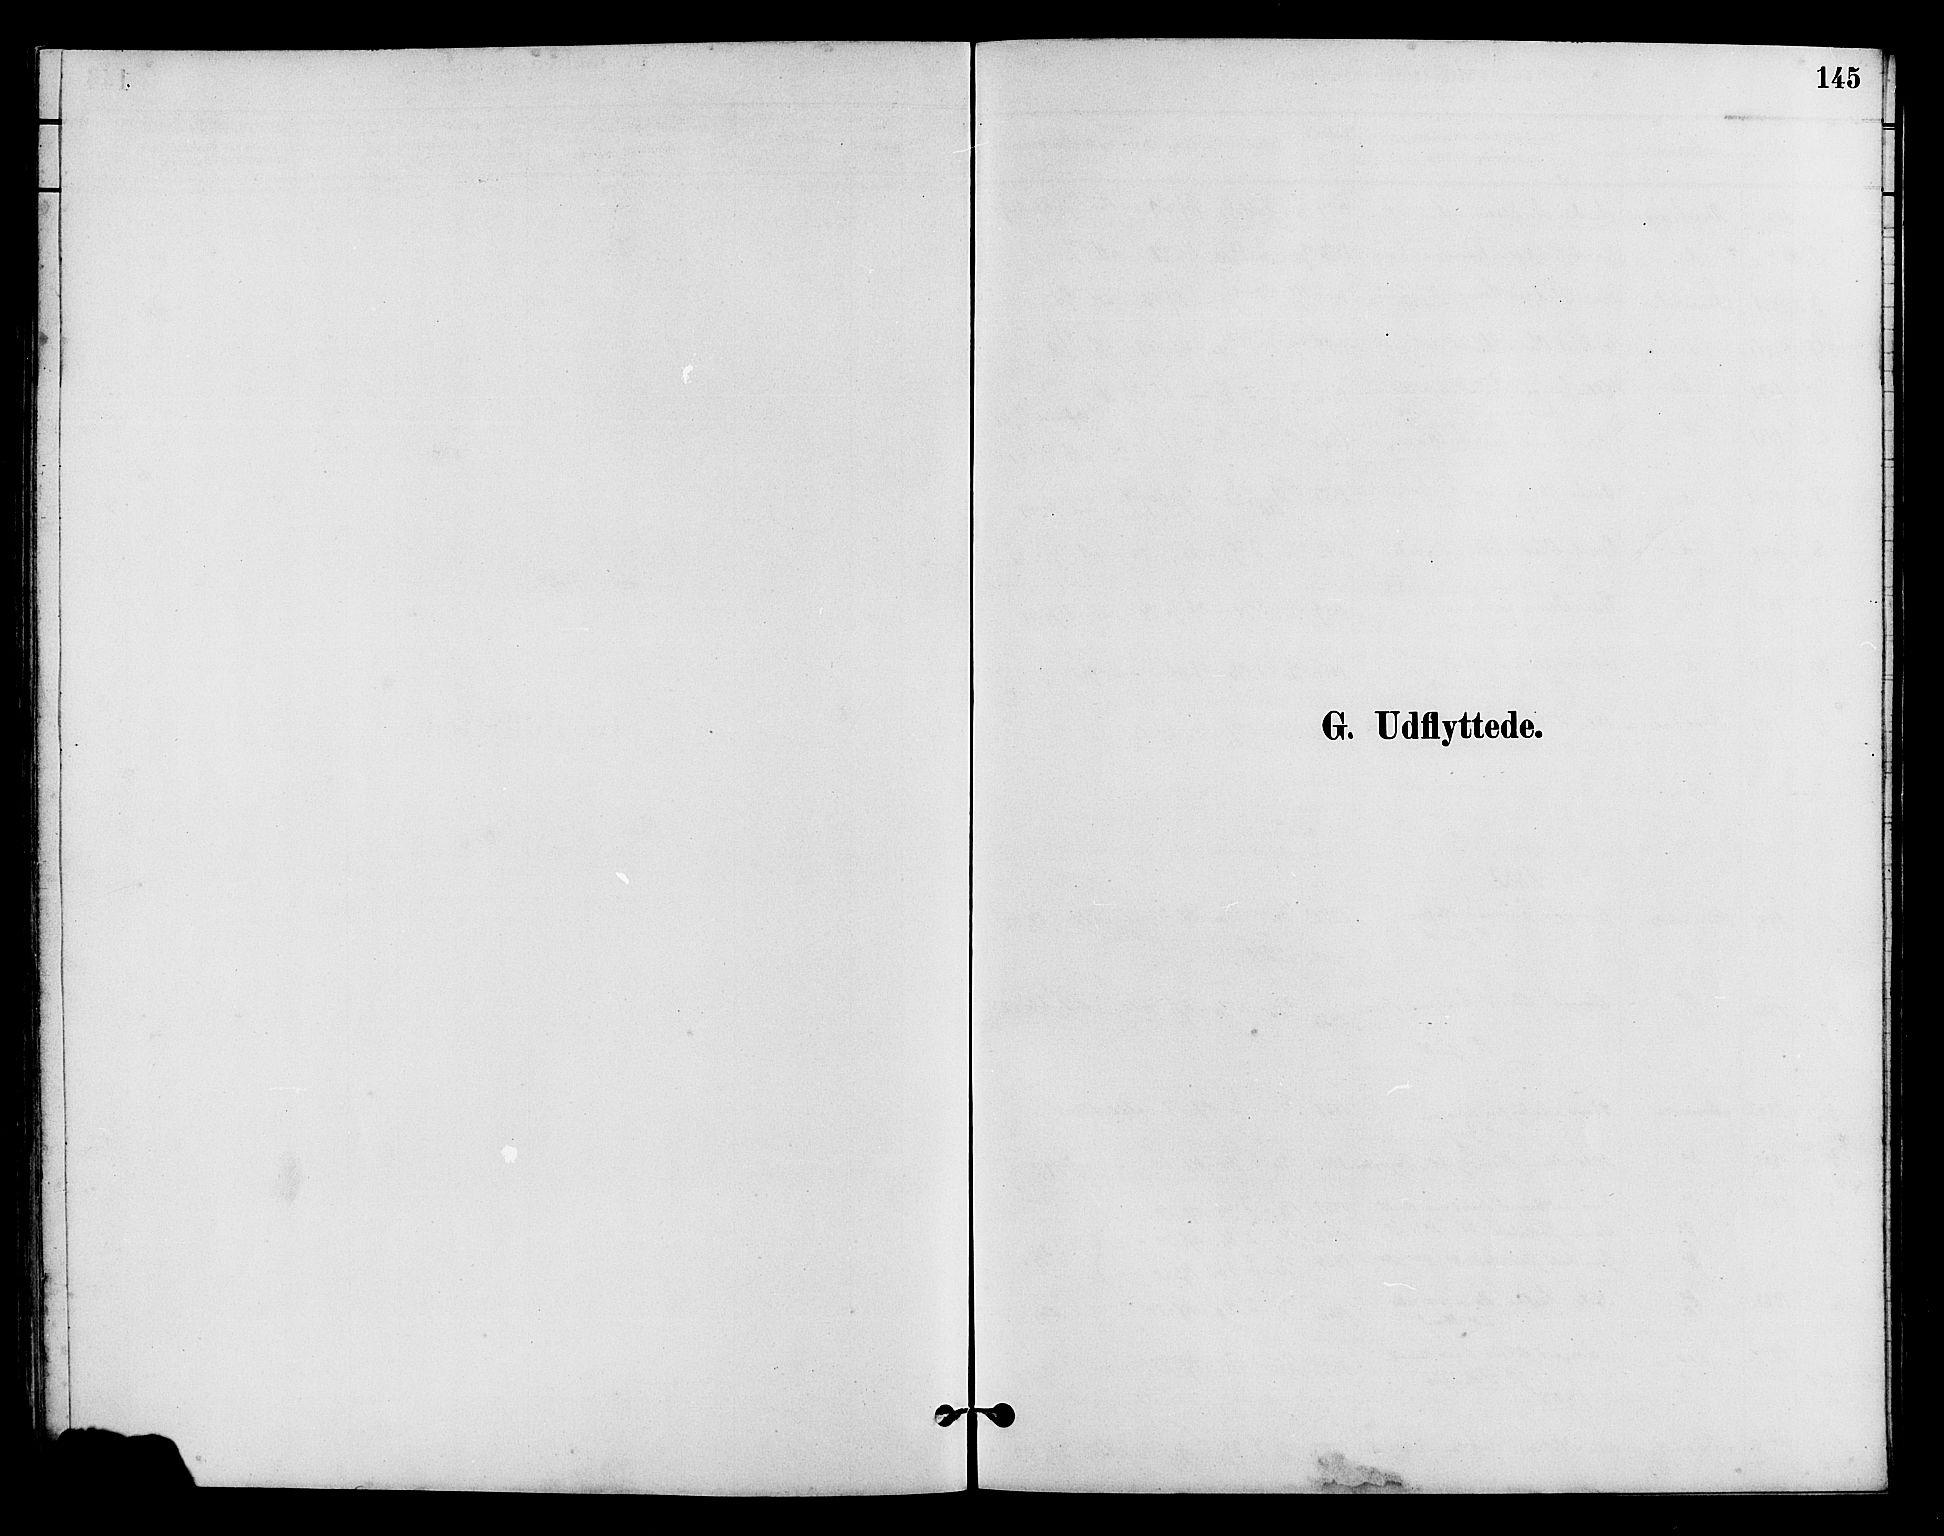 SAH, Vestre Slidre prestekontor, Klokkerbok nr. 5, 1881-1913, s. 145